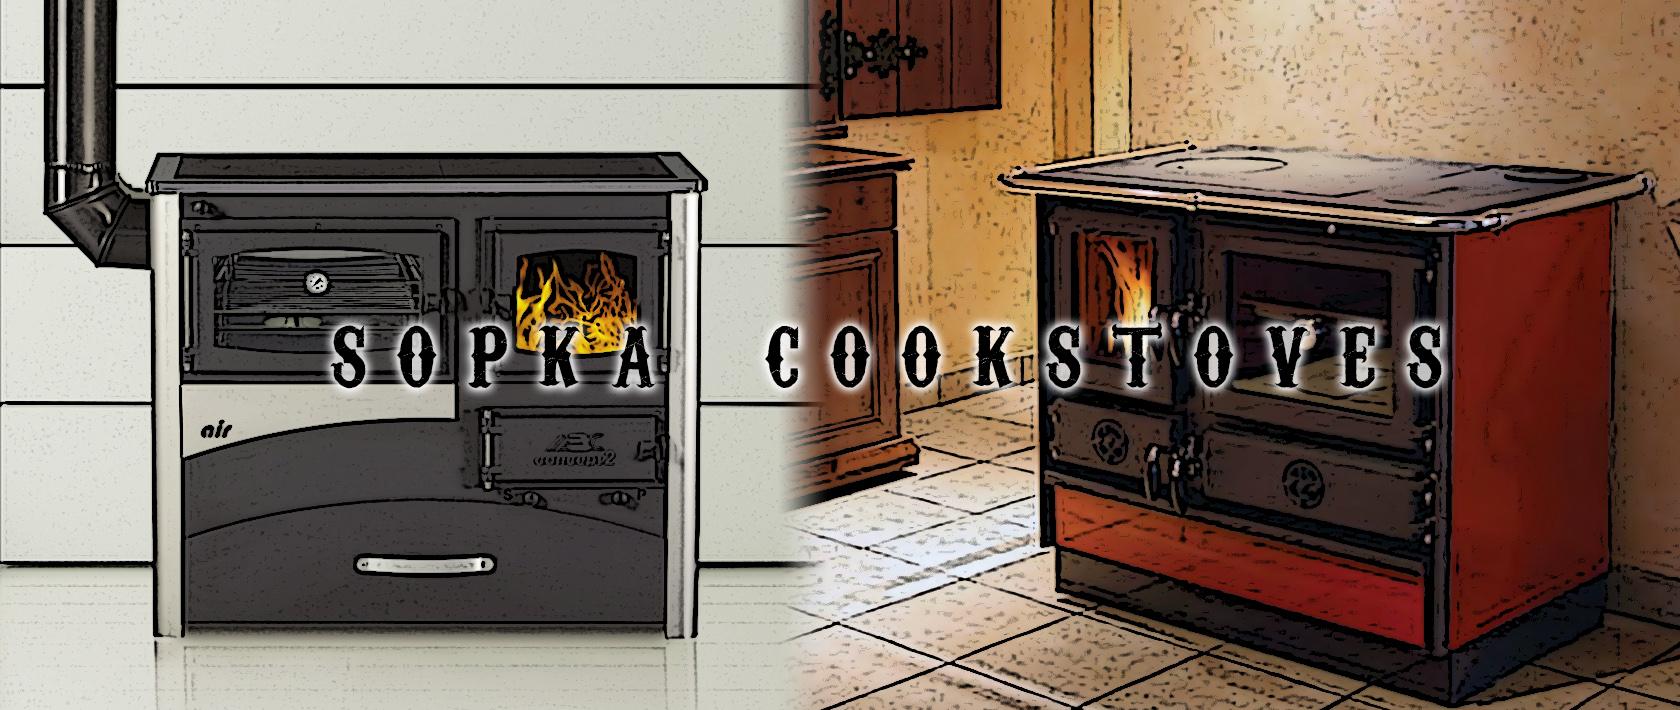 Sopka Cookstoves - Cookstove Community